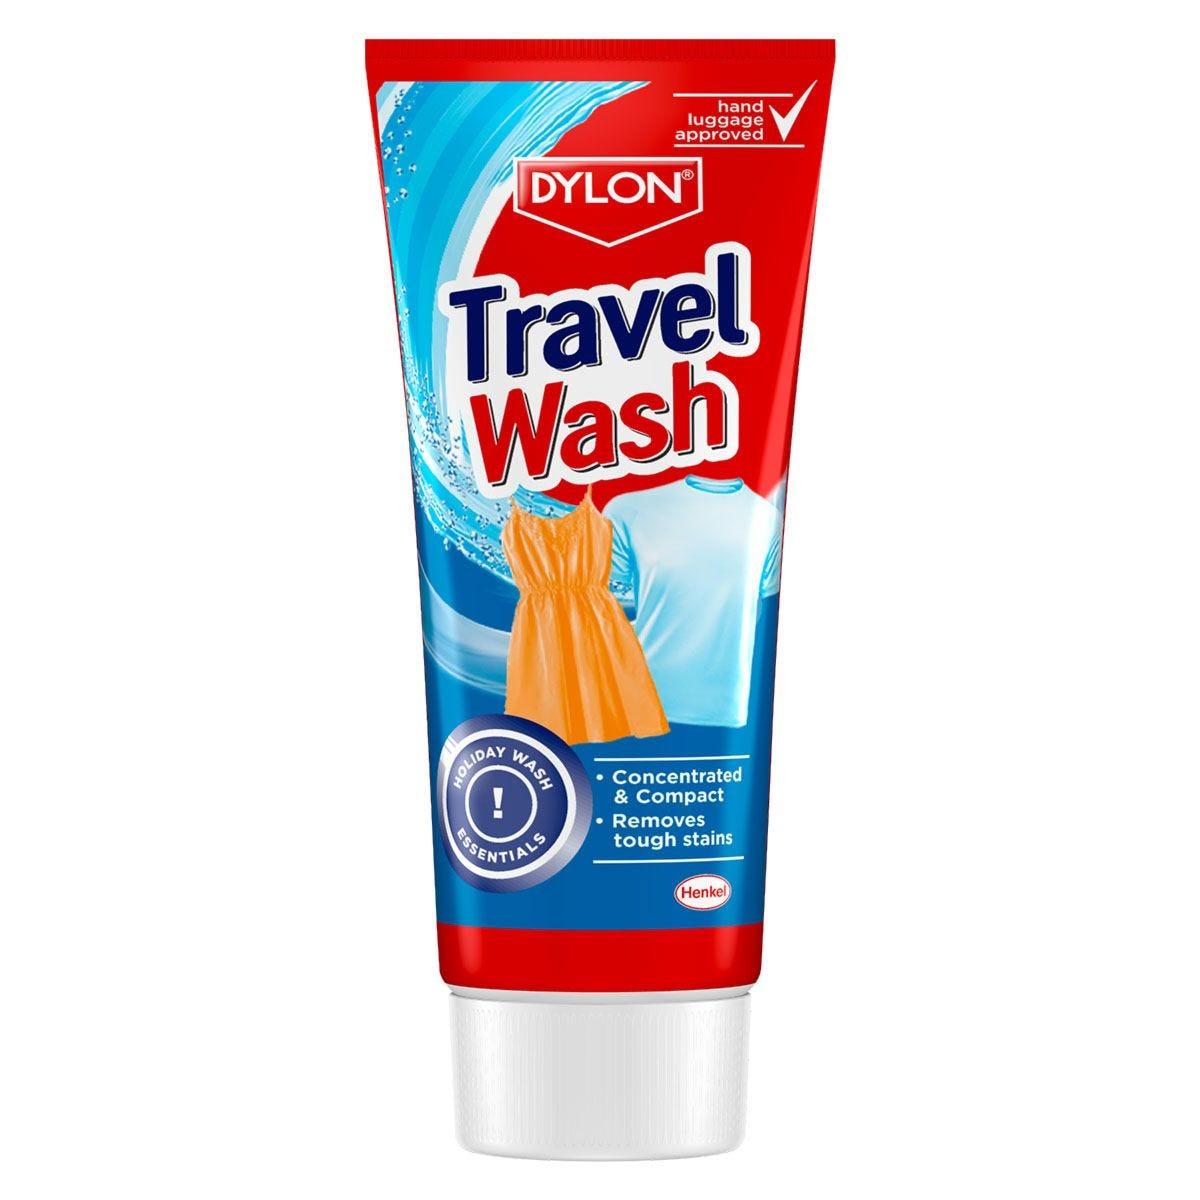 Dylon Travel Wash 75ml